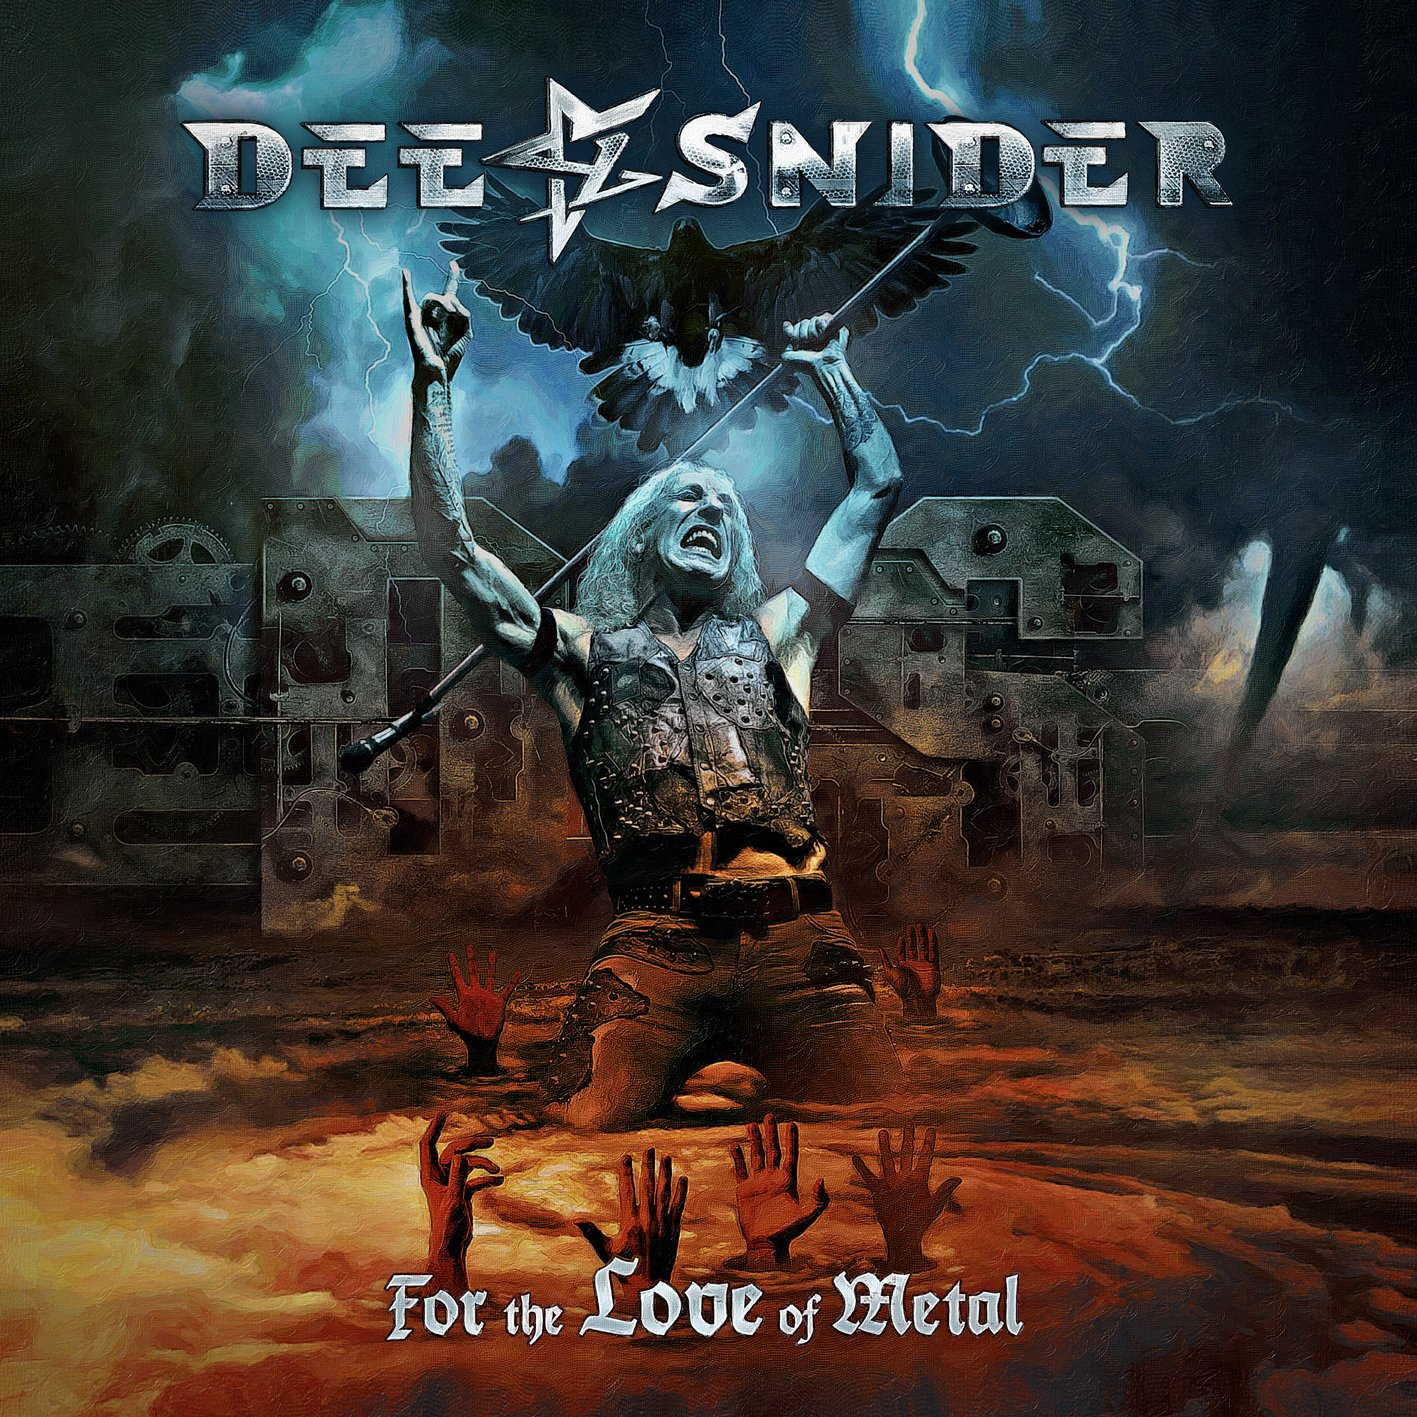 ¿Qué Estás Escuchando? - Página 4 Dee-Snider-%25E2%2580%2593-For-The-Love-Of-Metal-artwork-ghostcultmag